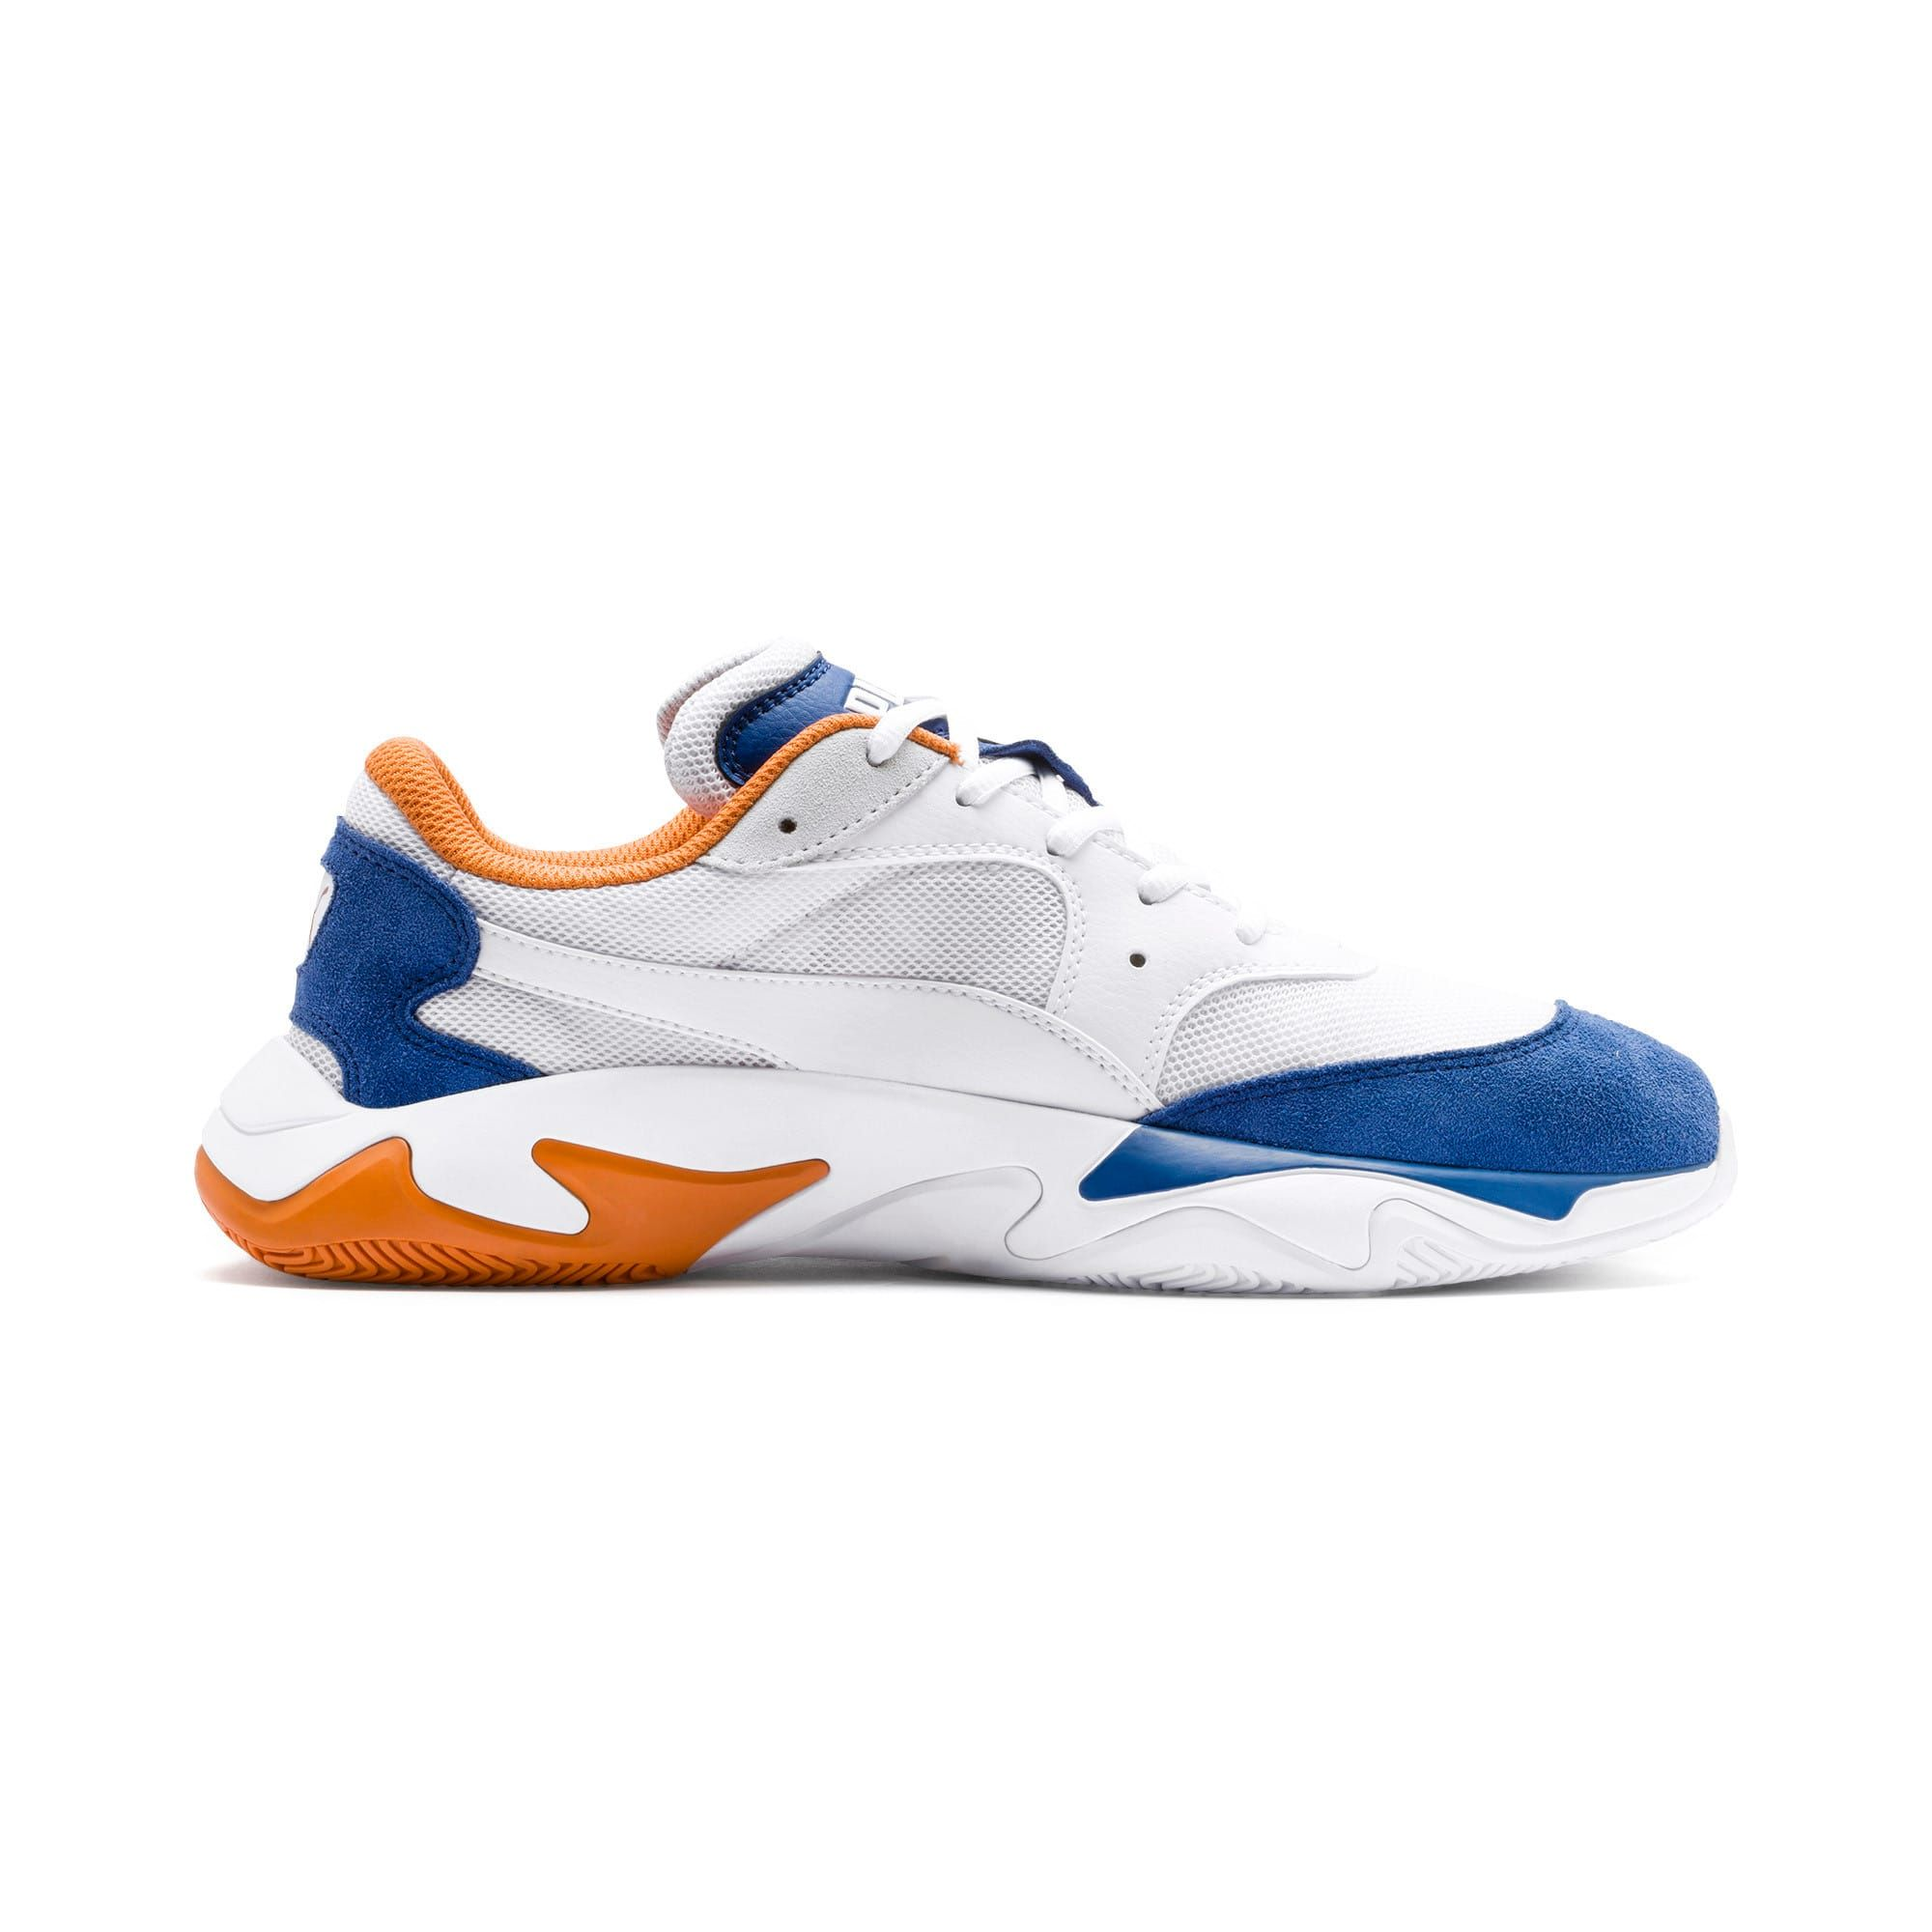 PUMA Chaussure Basket Storm Adrenaline, Bleu/Blanc, Taille ...